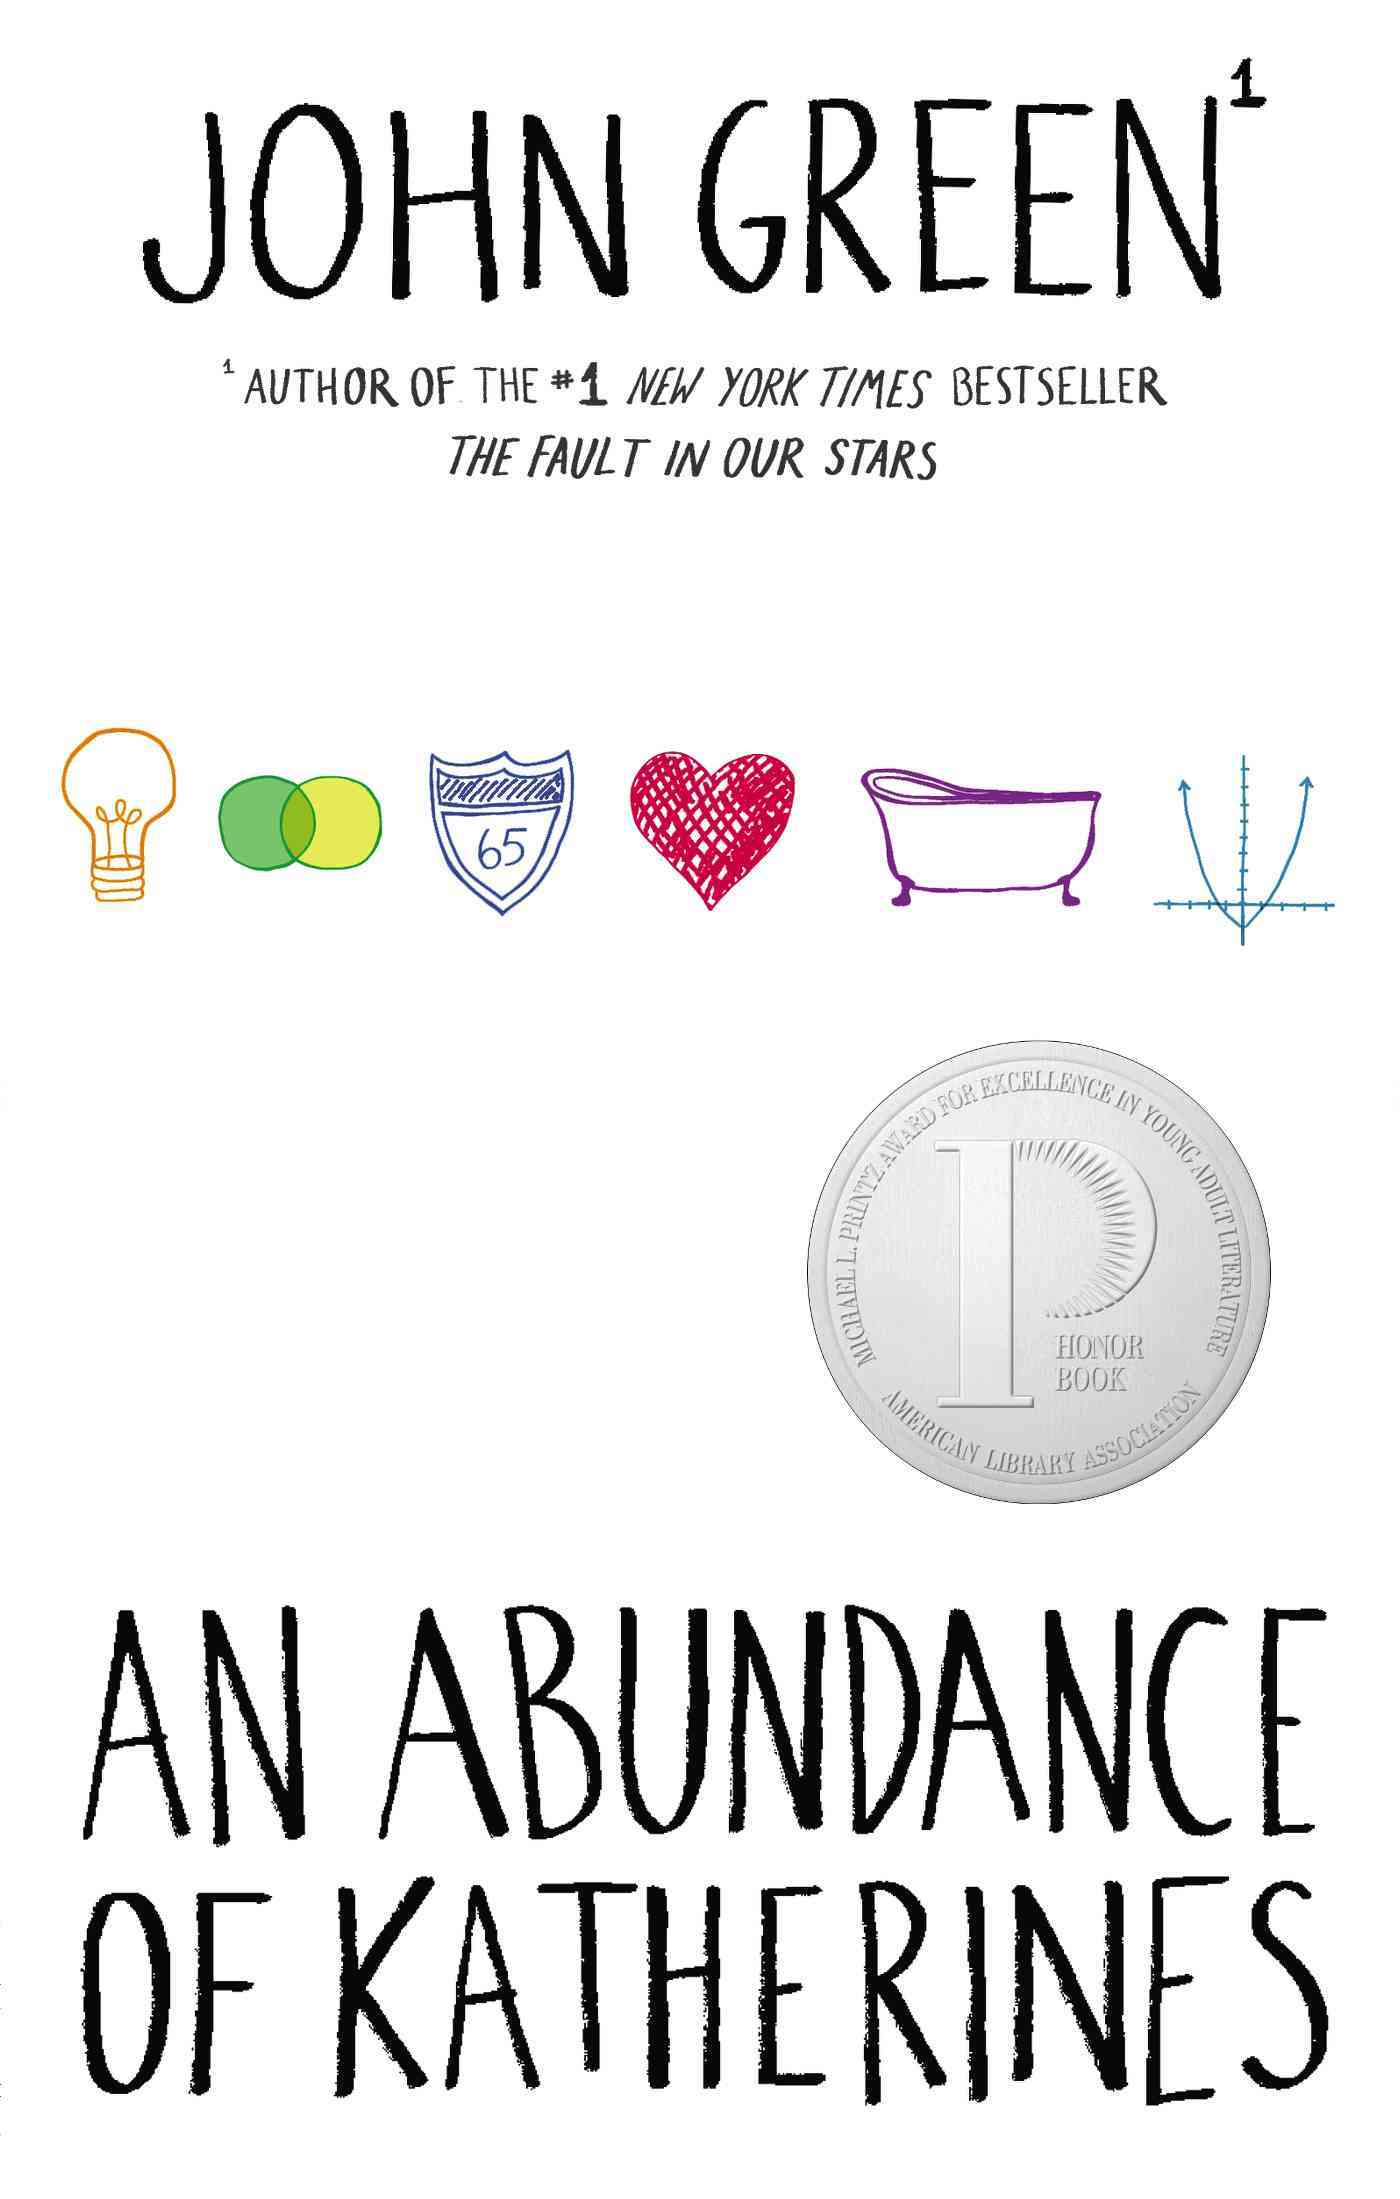 An Abundance of Katherines (Hardcover)